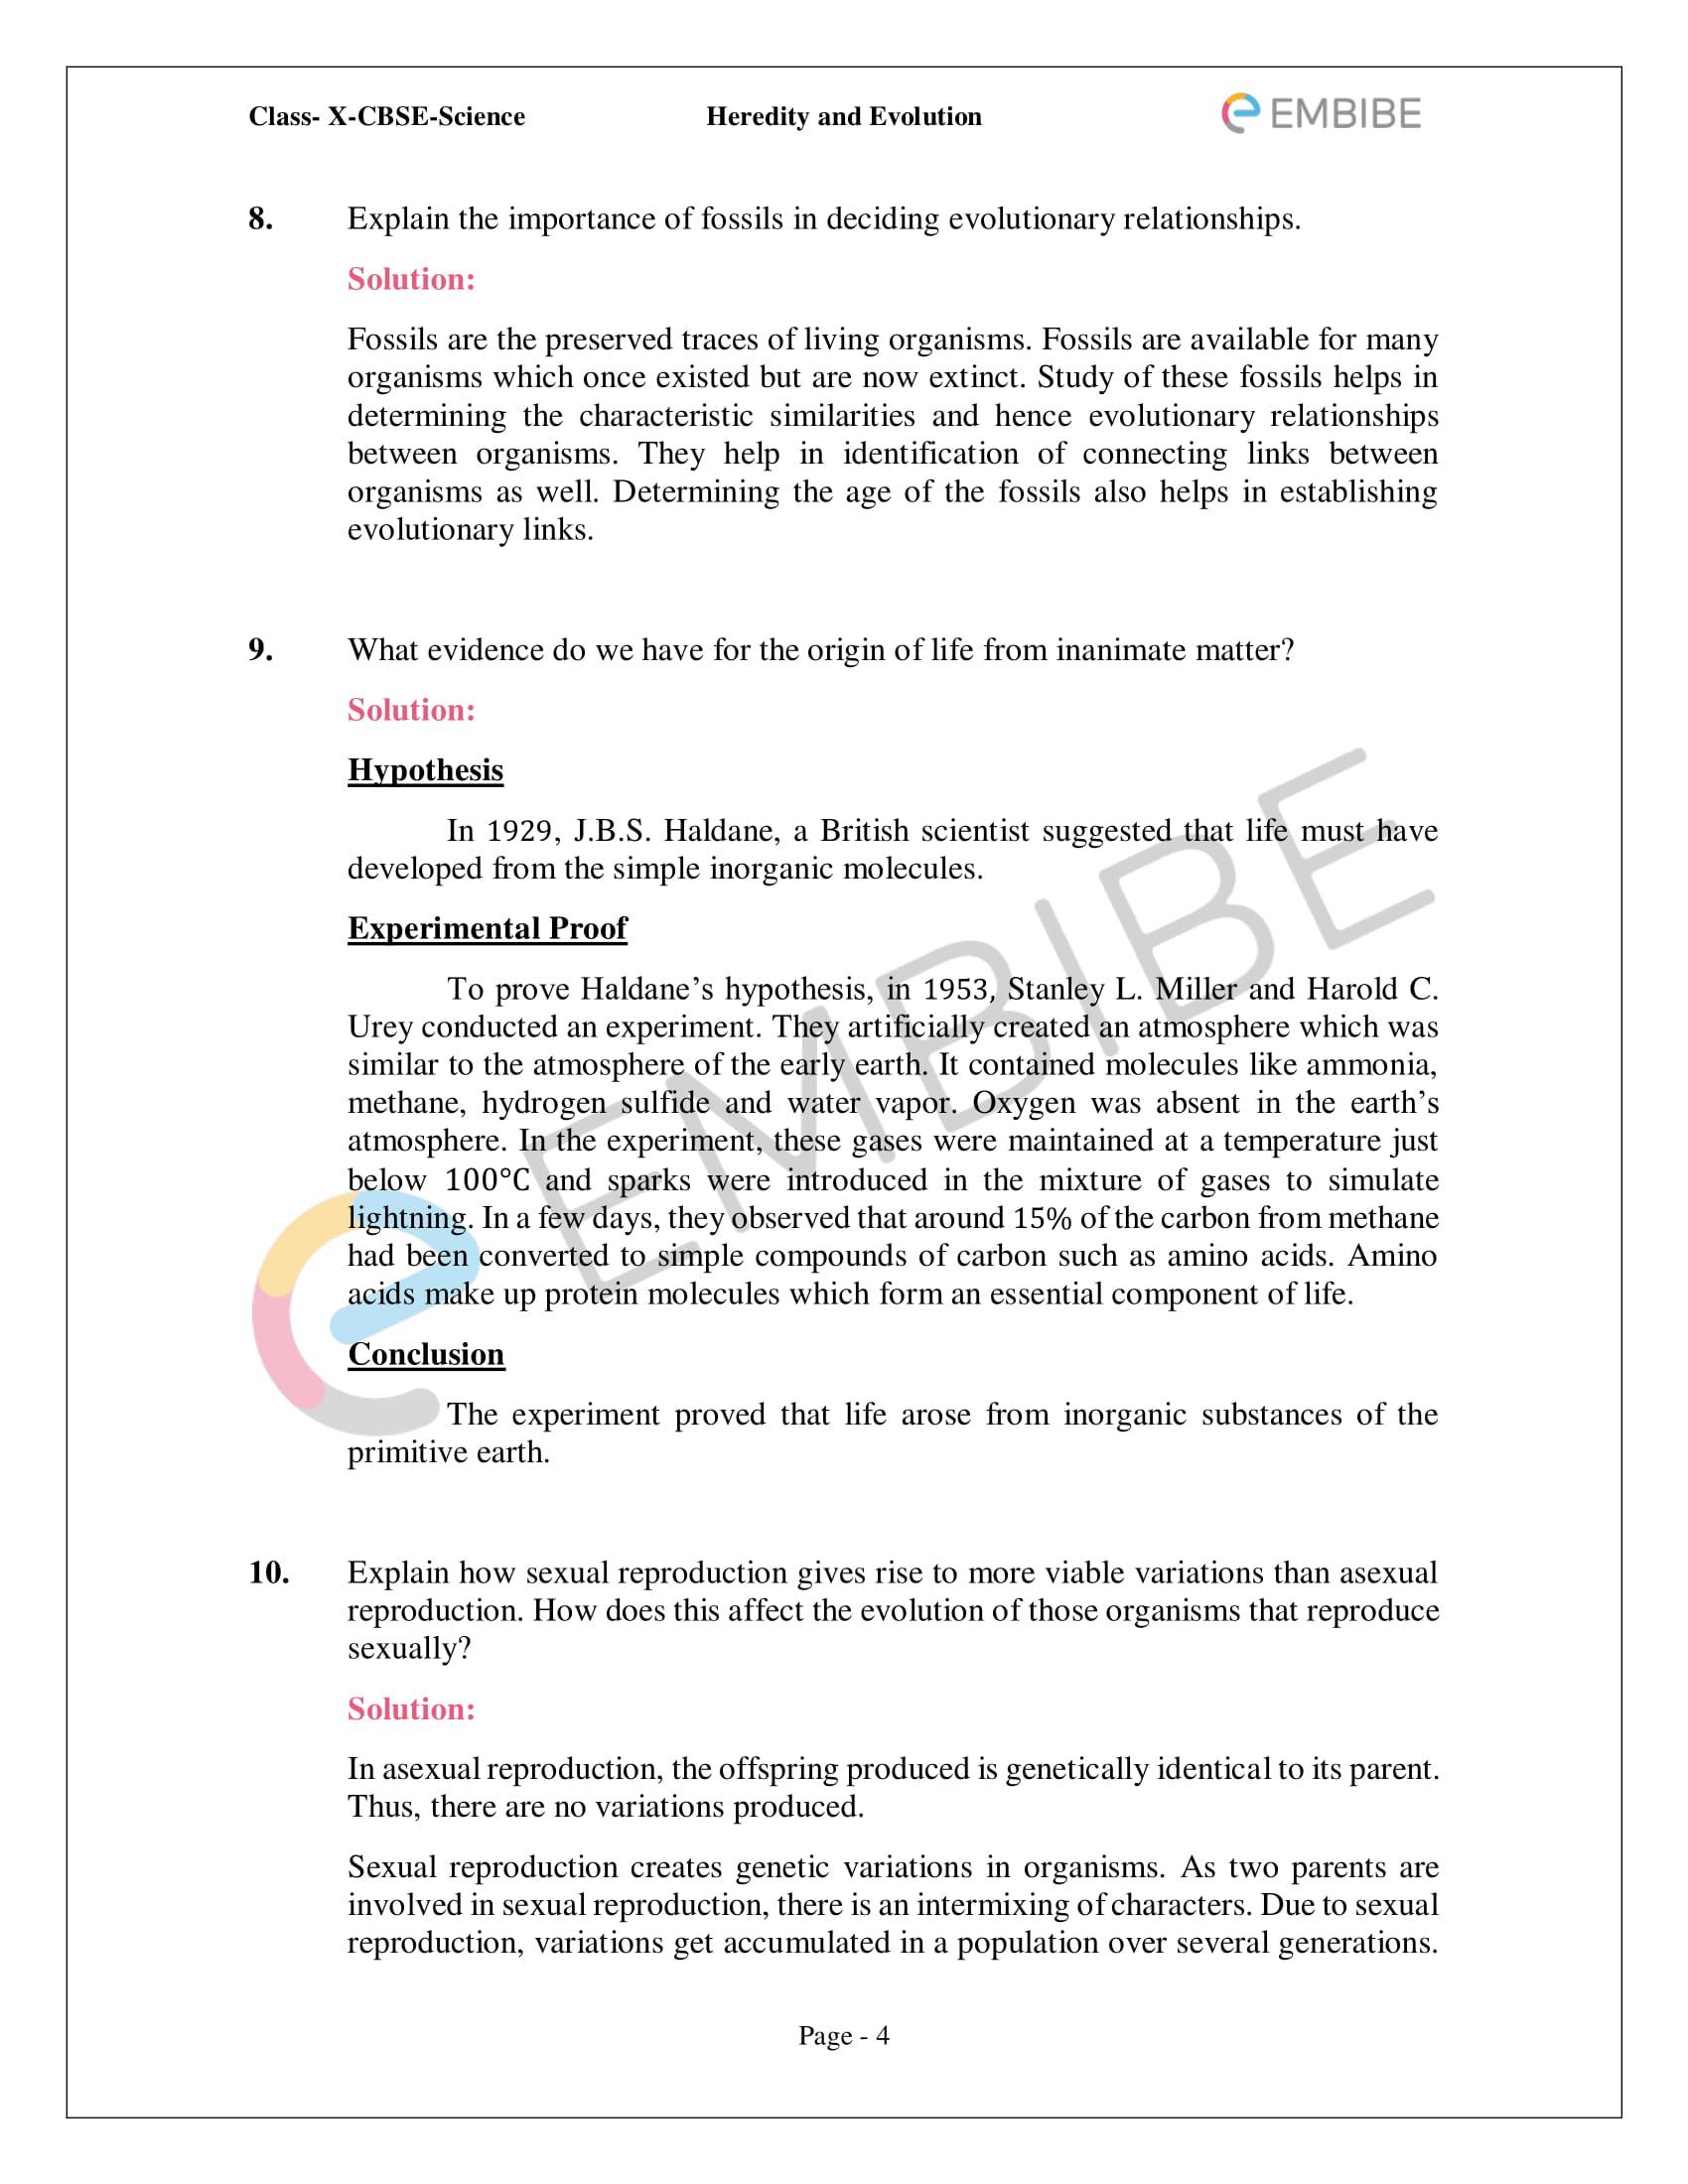 Heredity and Evolution_V3-04